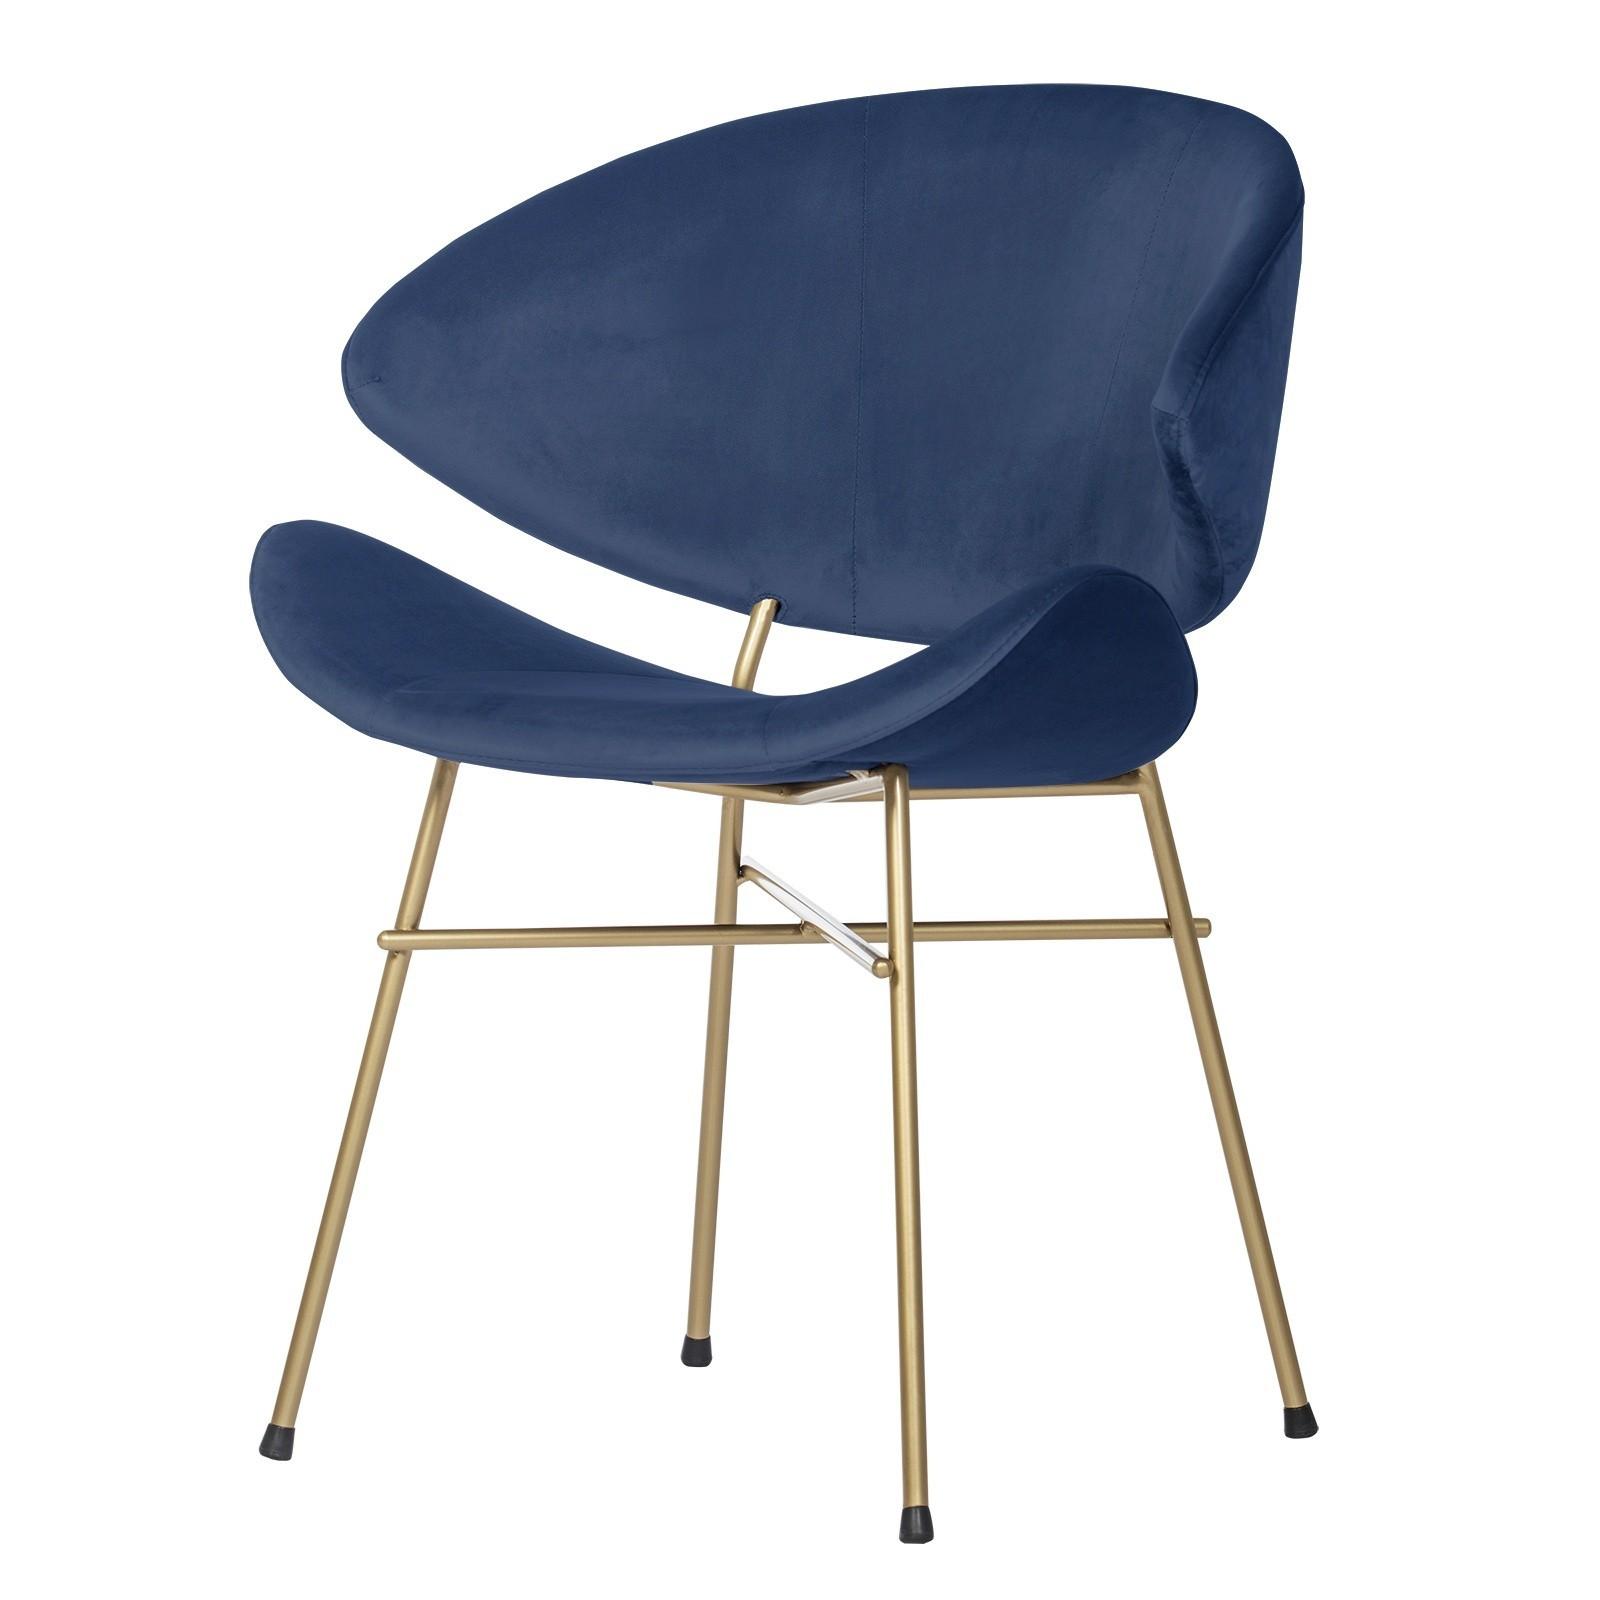 Cheri Gold - velours - chair - dark blue